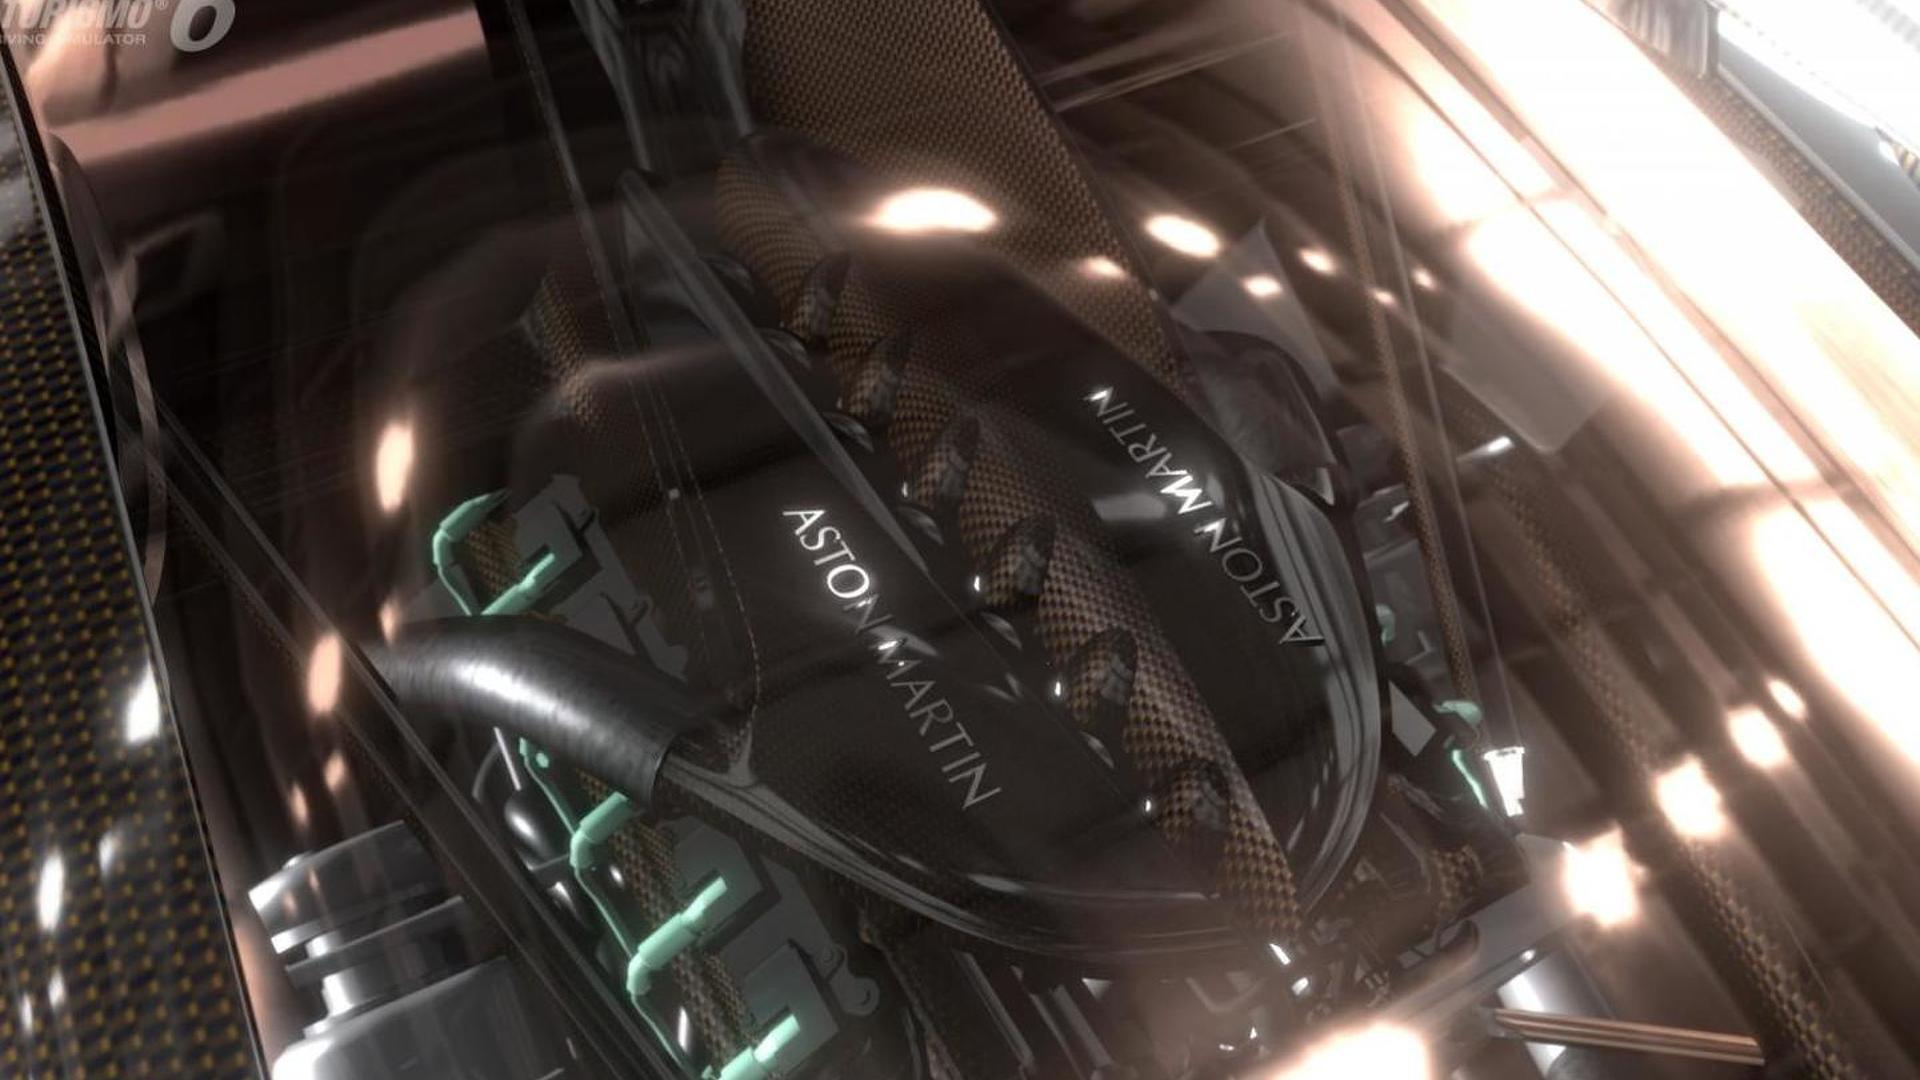 Aston Martin Dp 100 Vision Gran Turismo Teased